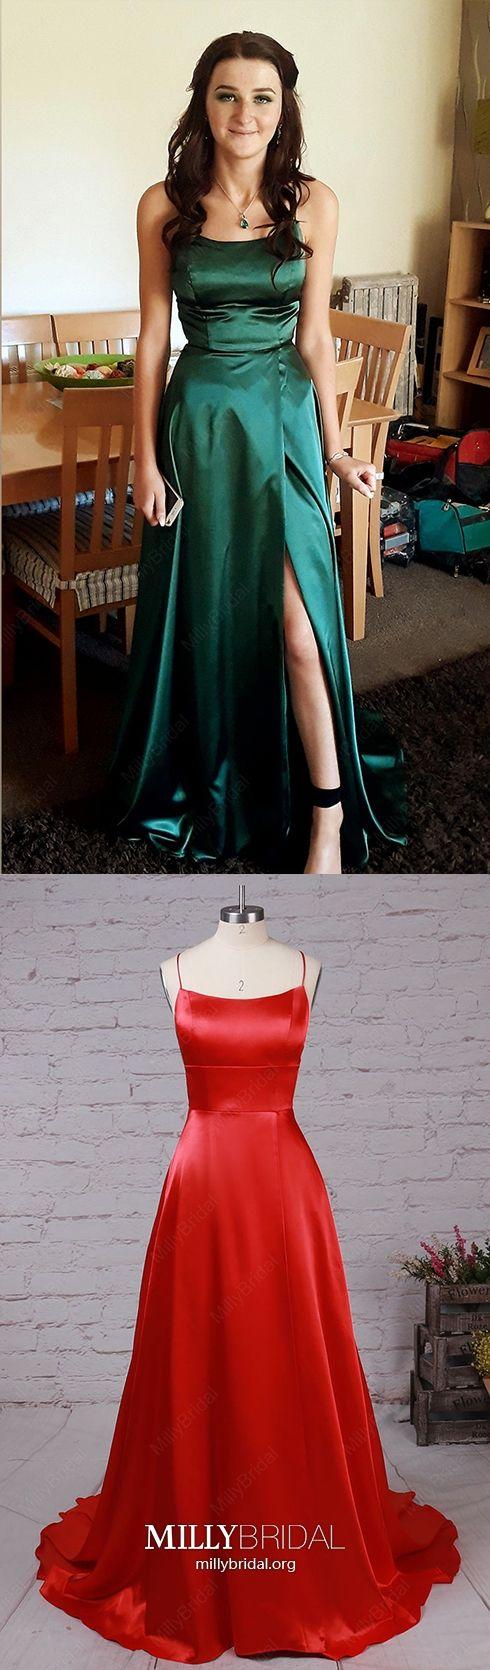 Long prom dresses with slit dark green formal evening dresses